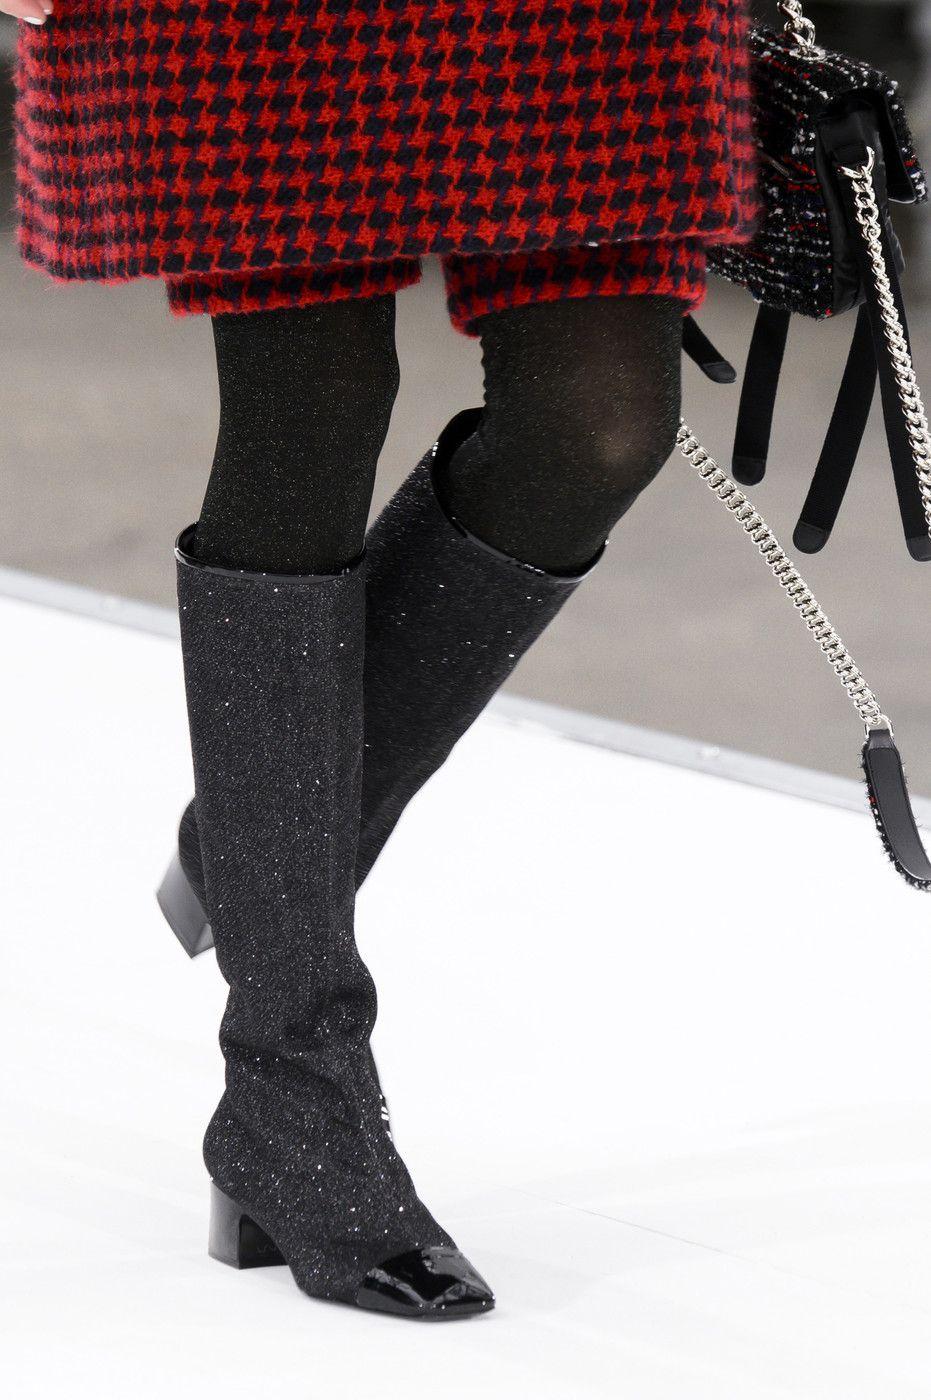 Chanel at Paris Fall 2017 (Details)